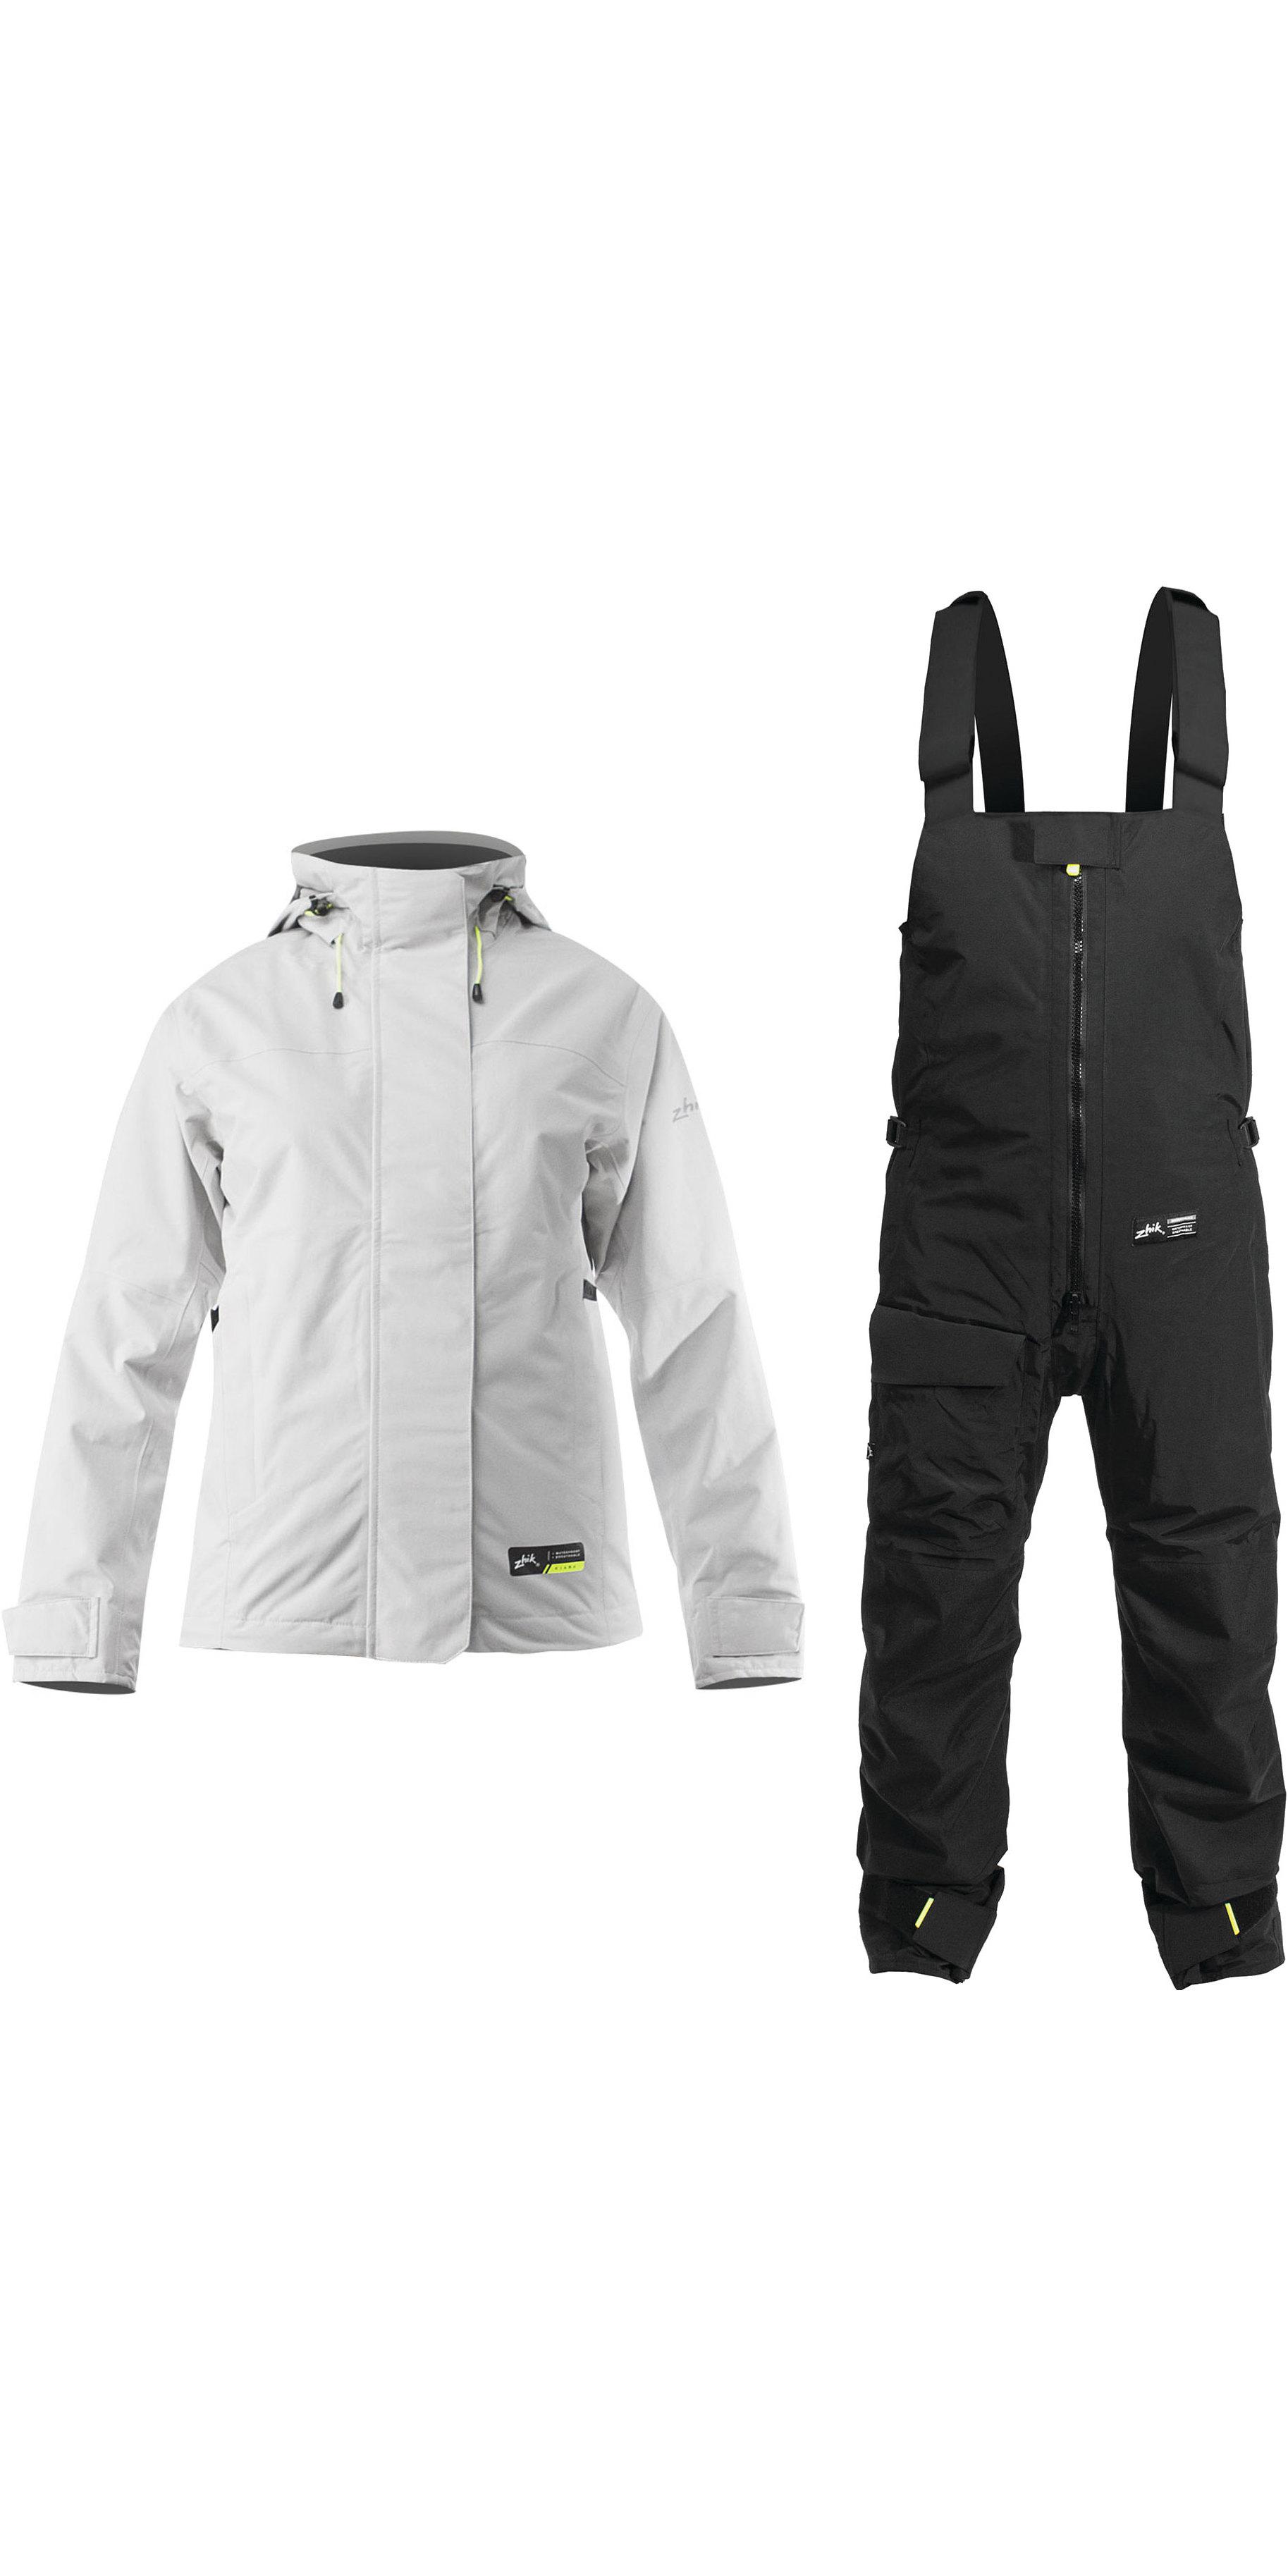 Zhik Womens Kiama Inshore Sailing Jacket & Trouser Combi Set